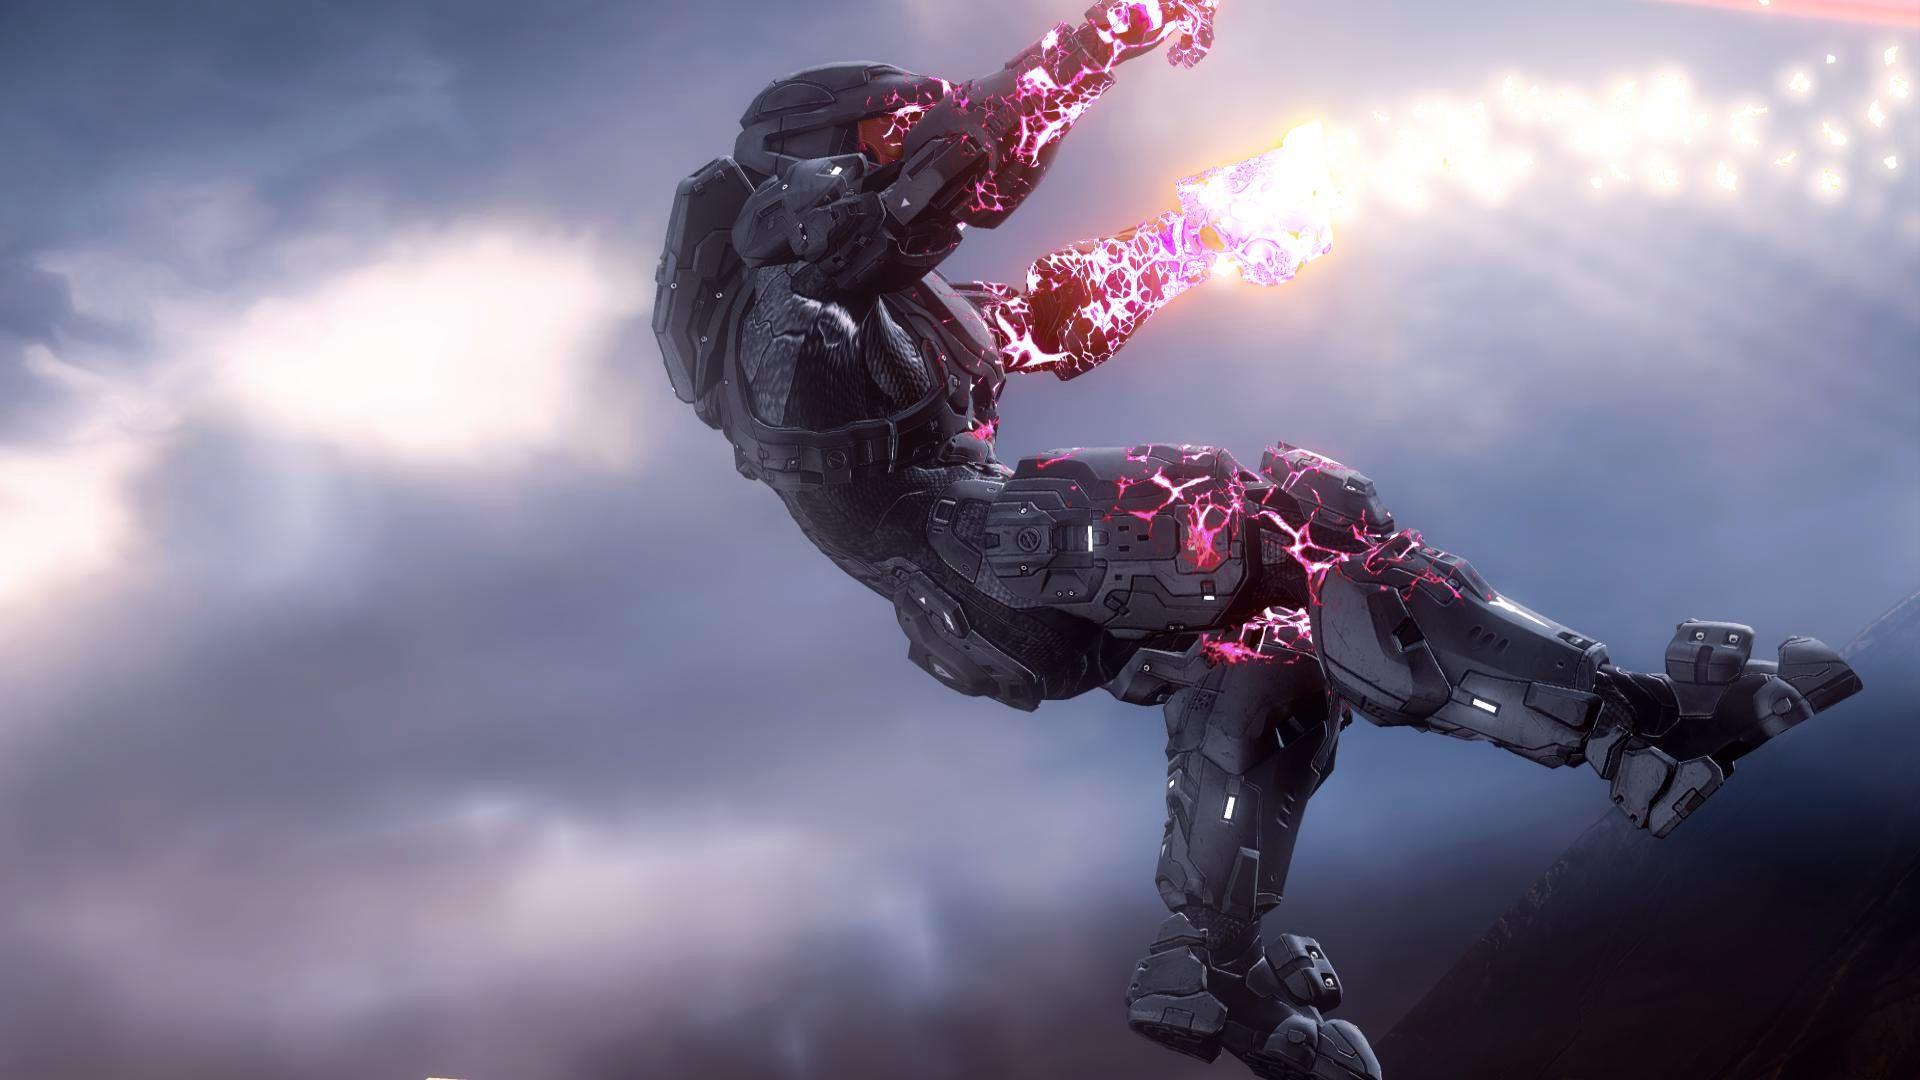 Halo 5 Guardians Video Game 21 Hd Wallpaper   Hivewallpapercom 1920x1080